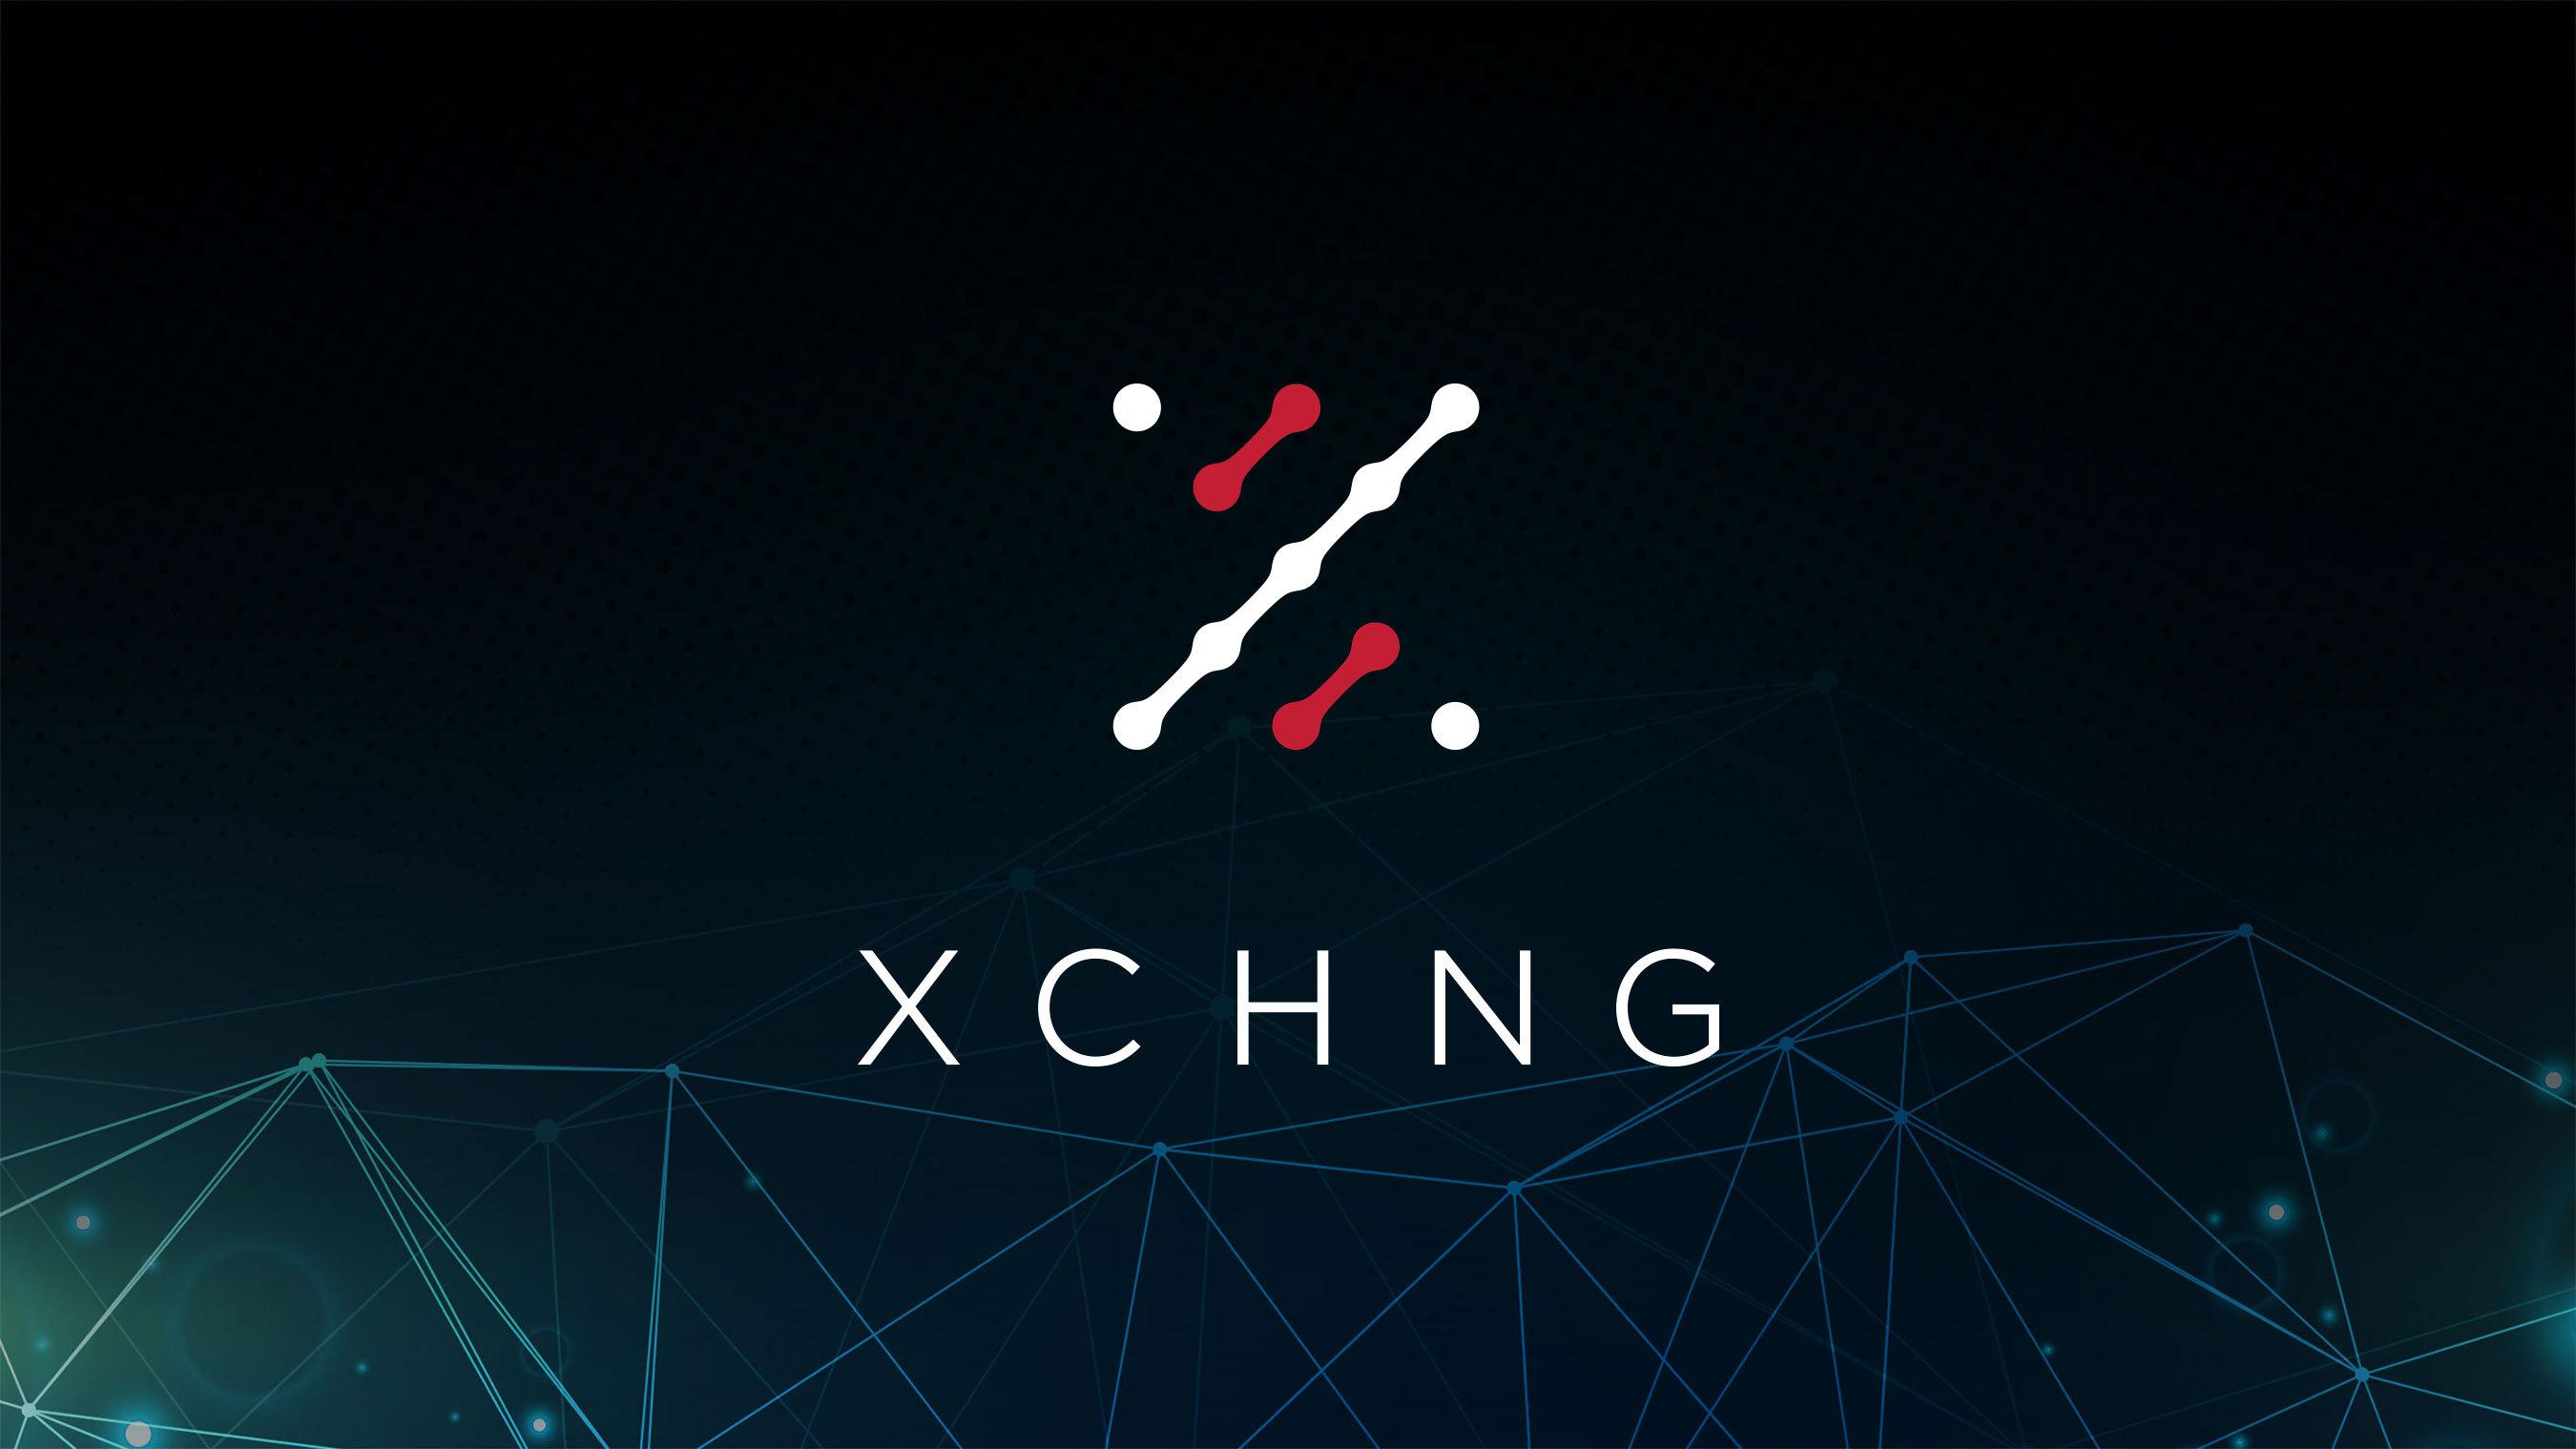 XCHNG